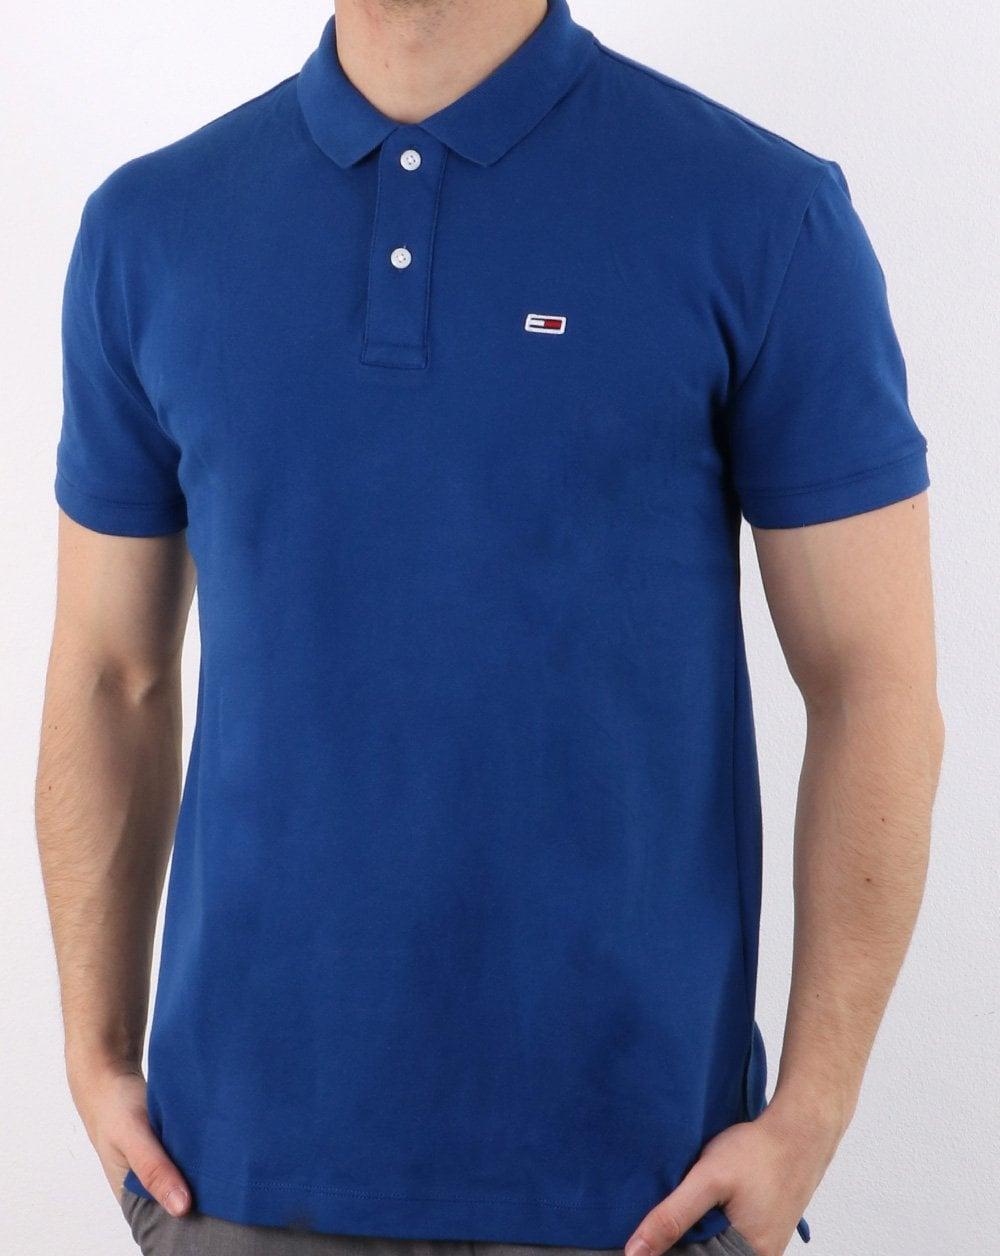 42e23e4b389a6 Tommy Hilfiger Classic Pique Polo Shirt Blue | 80s casual classics